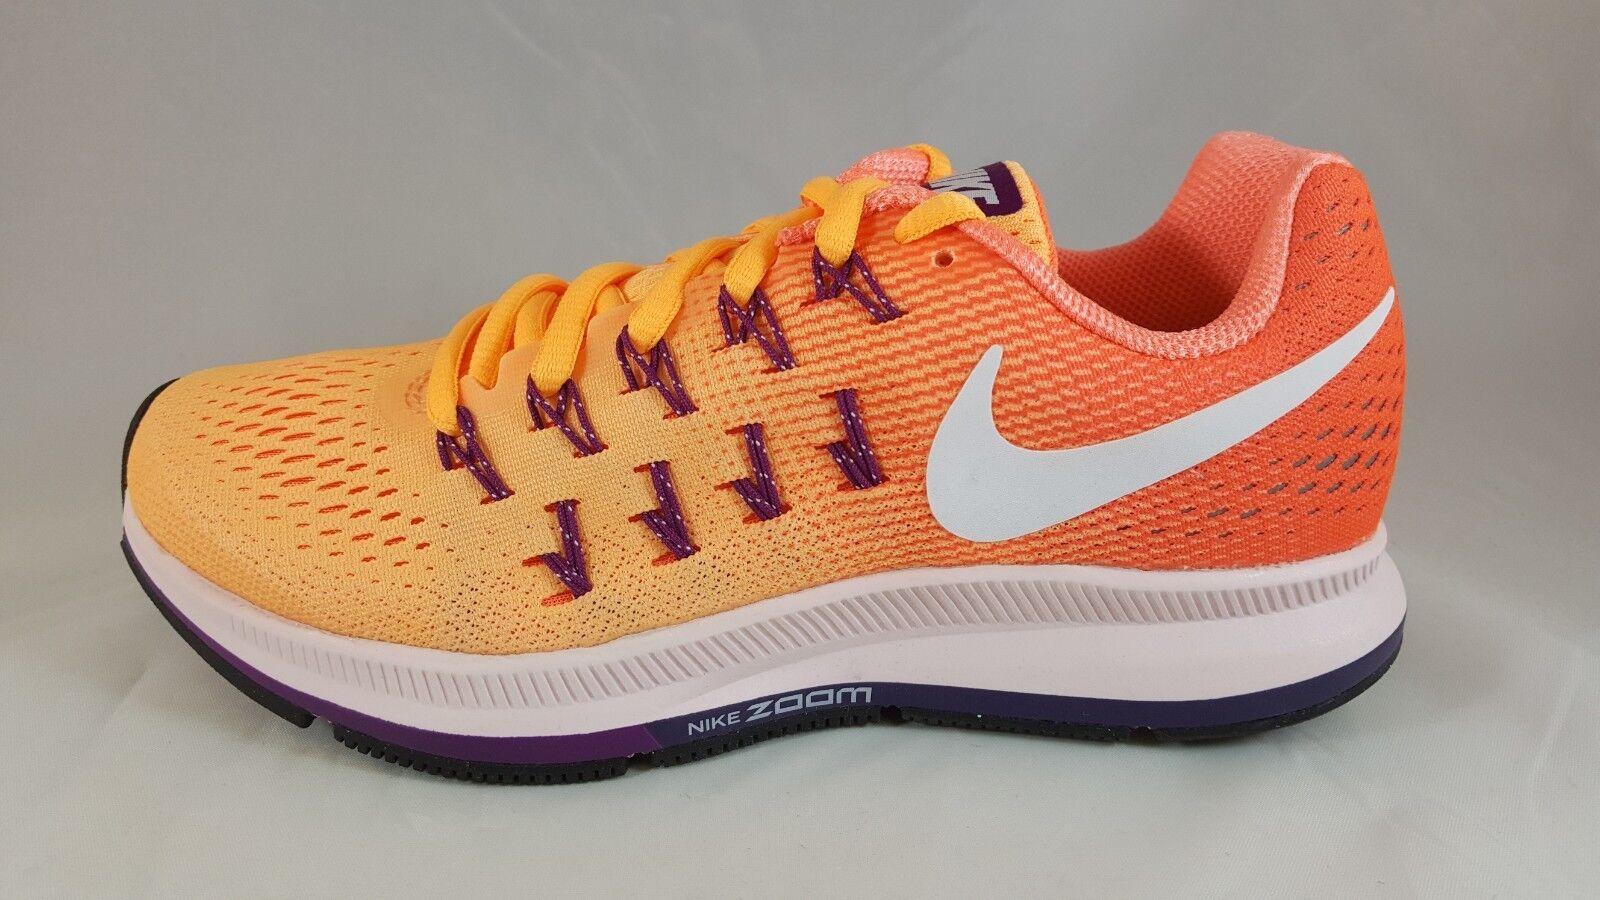 Nike air zoom pegasus 33 le scarpe da ginnastica 831356 800 numero 5